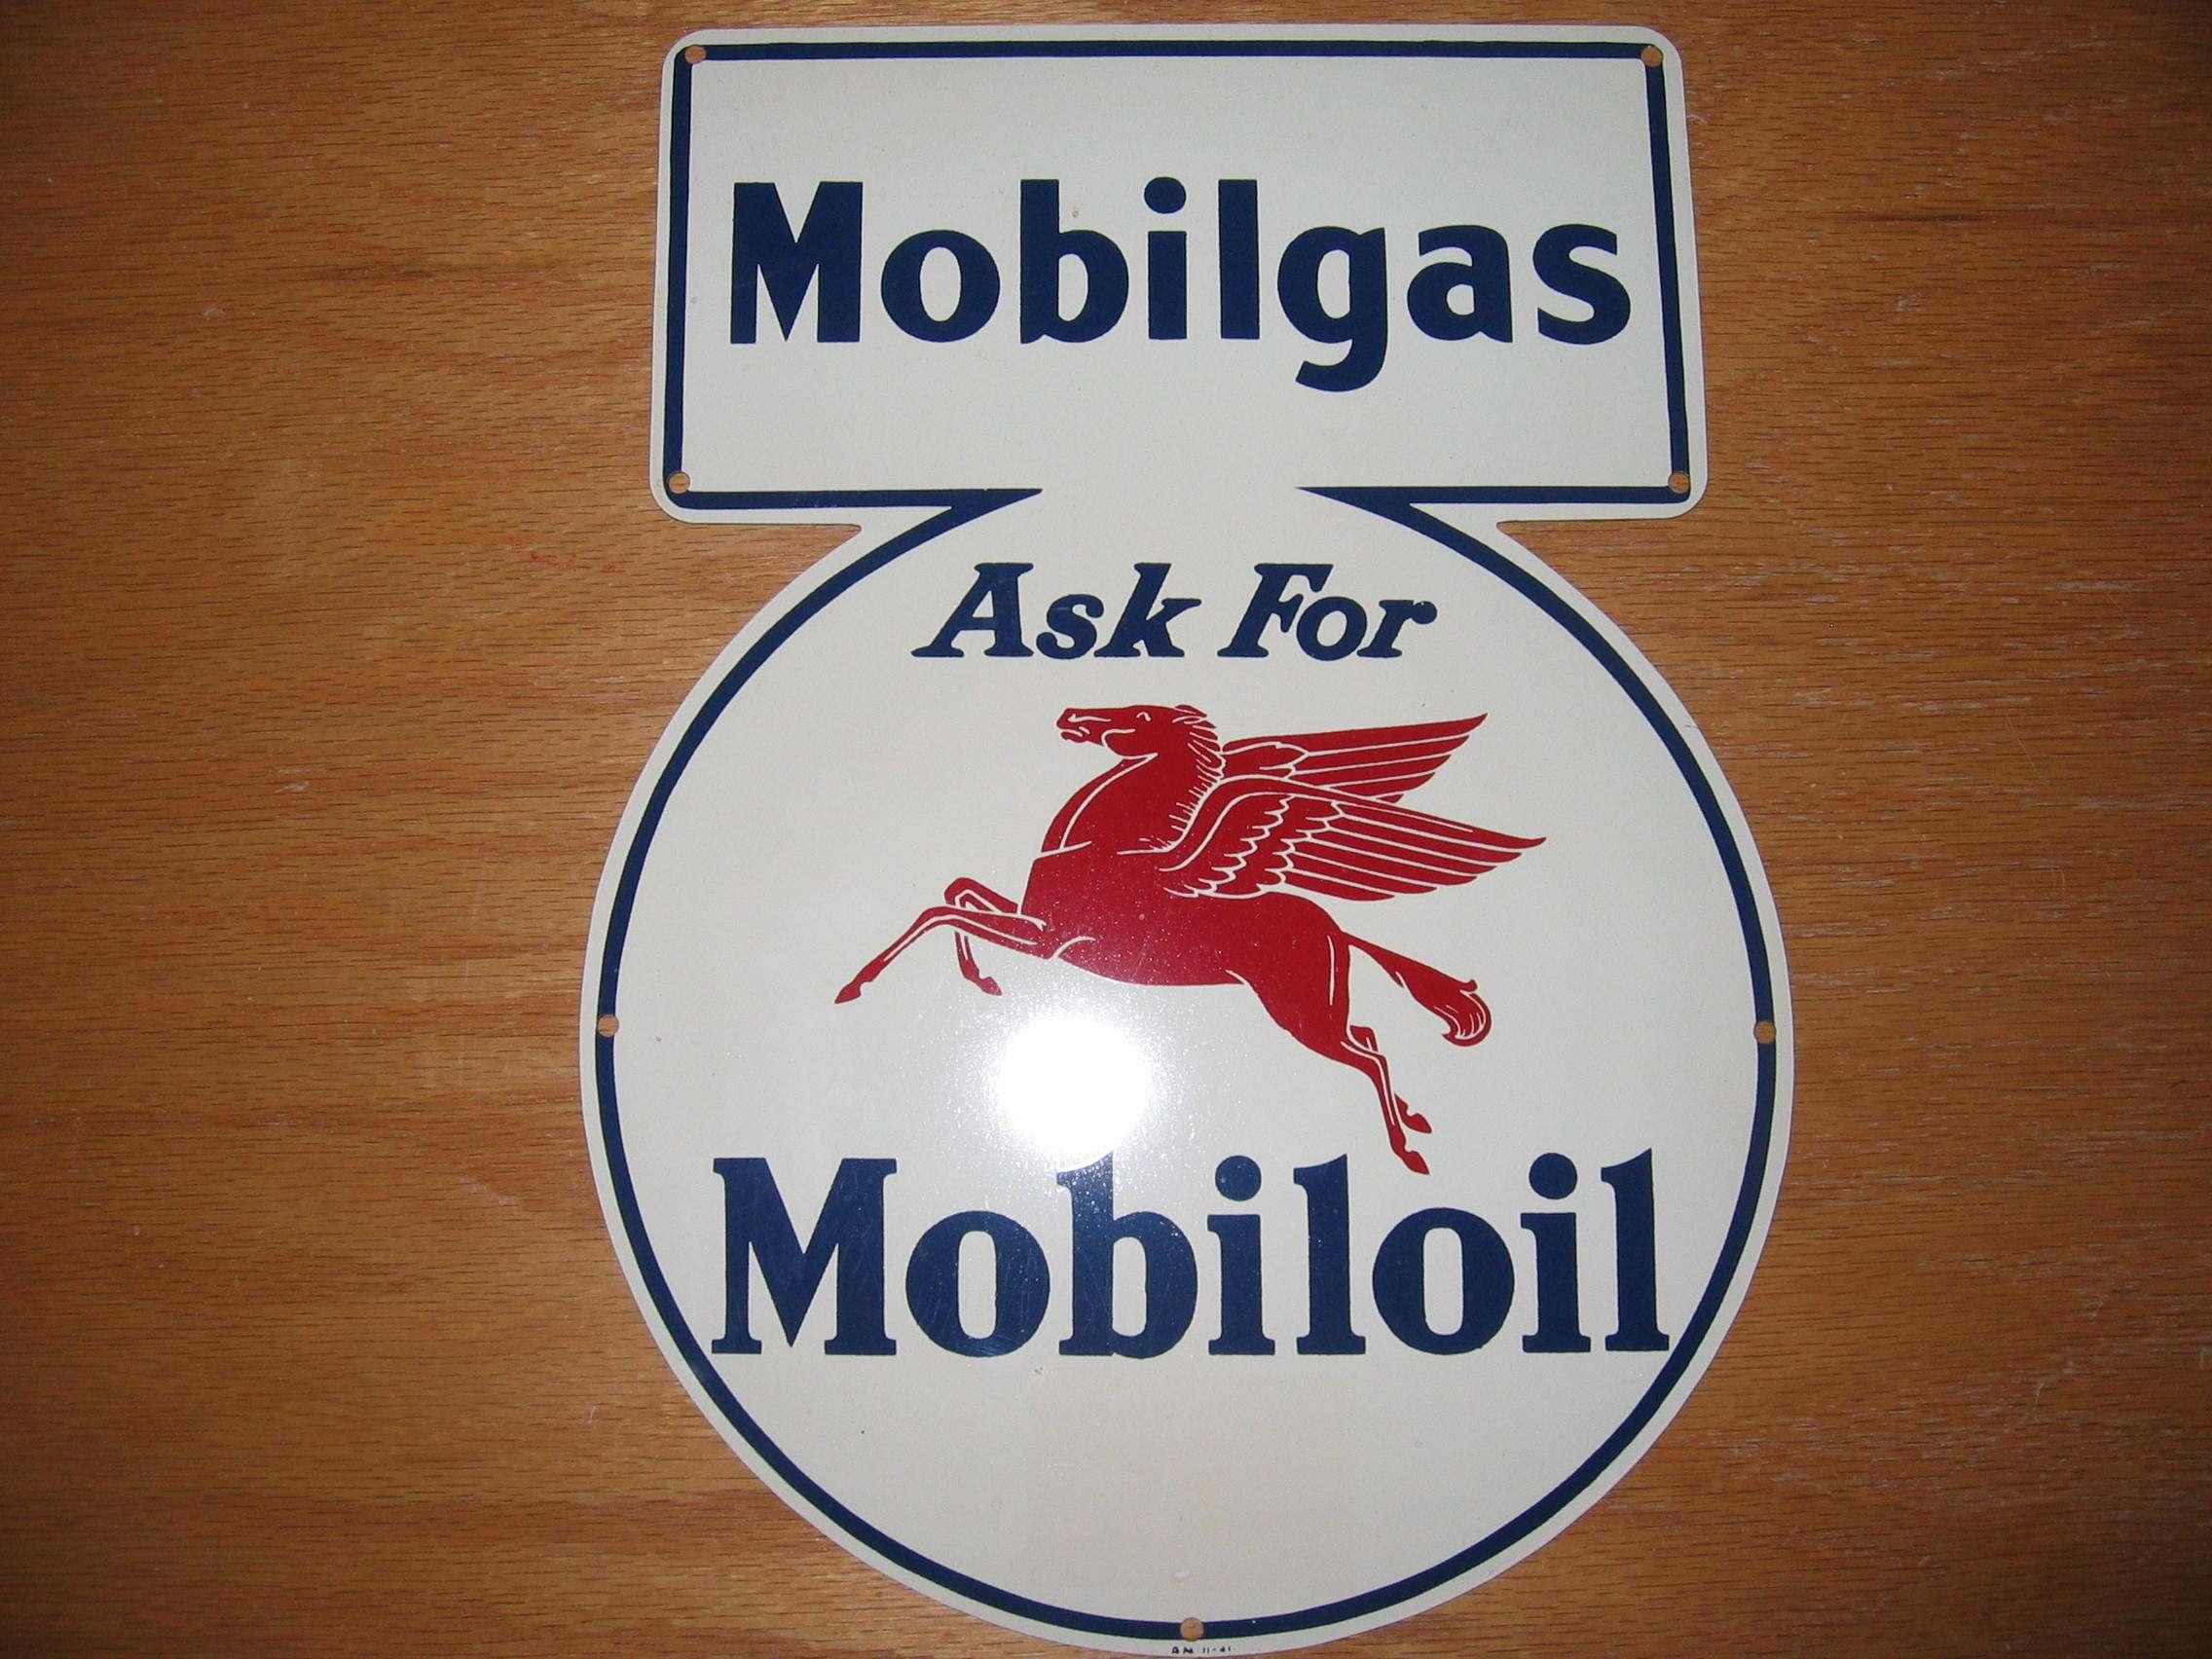 Mobilgas real or fake ? - Primarily Petroliana Shop Talk